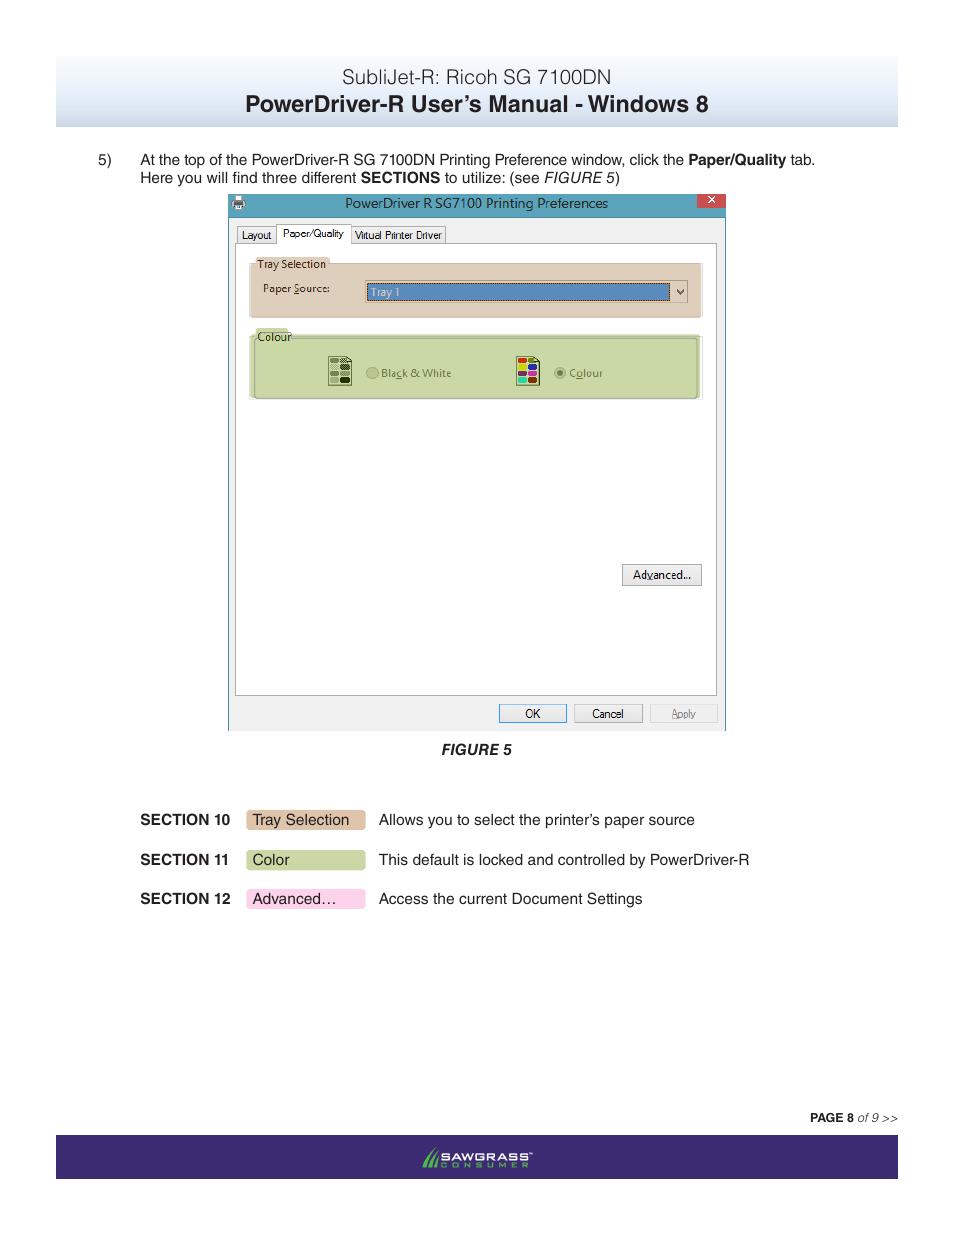 Powerdriver-r user's manual - windows 8, Sublijet-r: ricoh sg 7100dn |  Xpres SubliJet R Ricoh SG7100DN (Windows Power Driver Setup): Power Driver  User ...